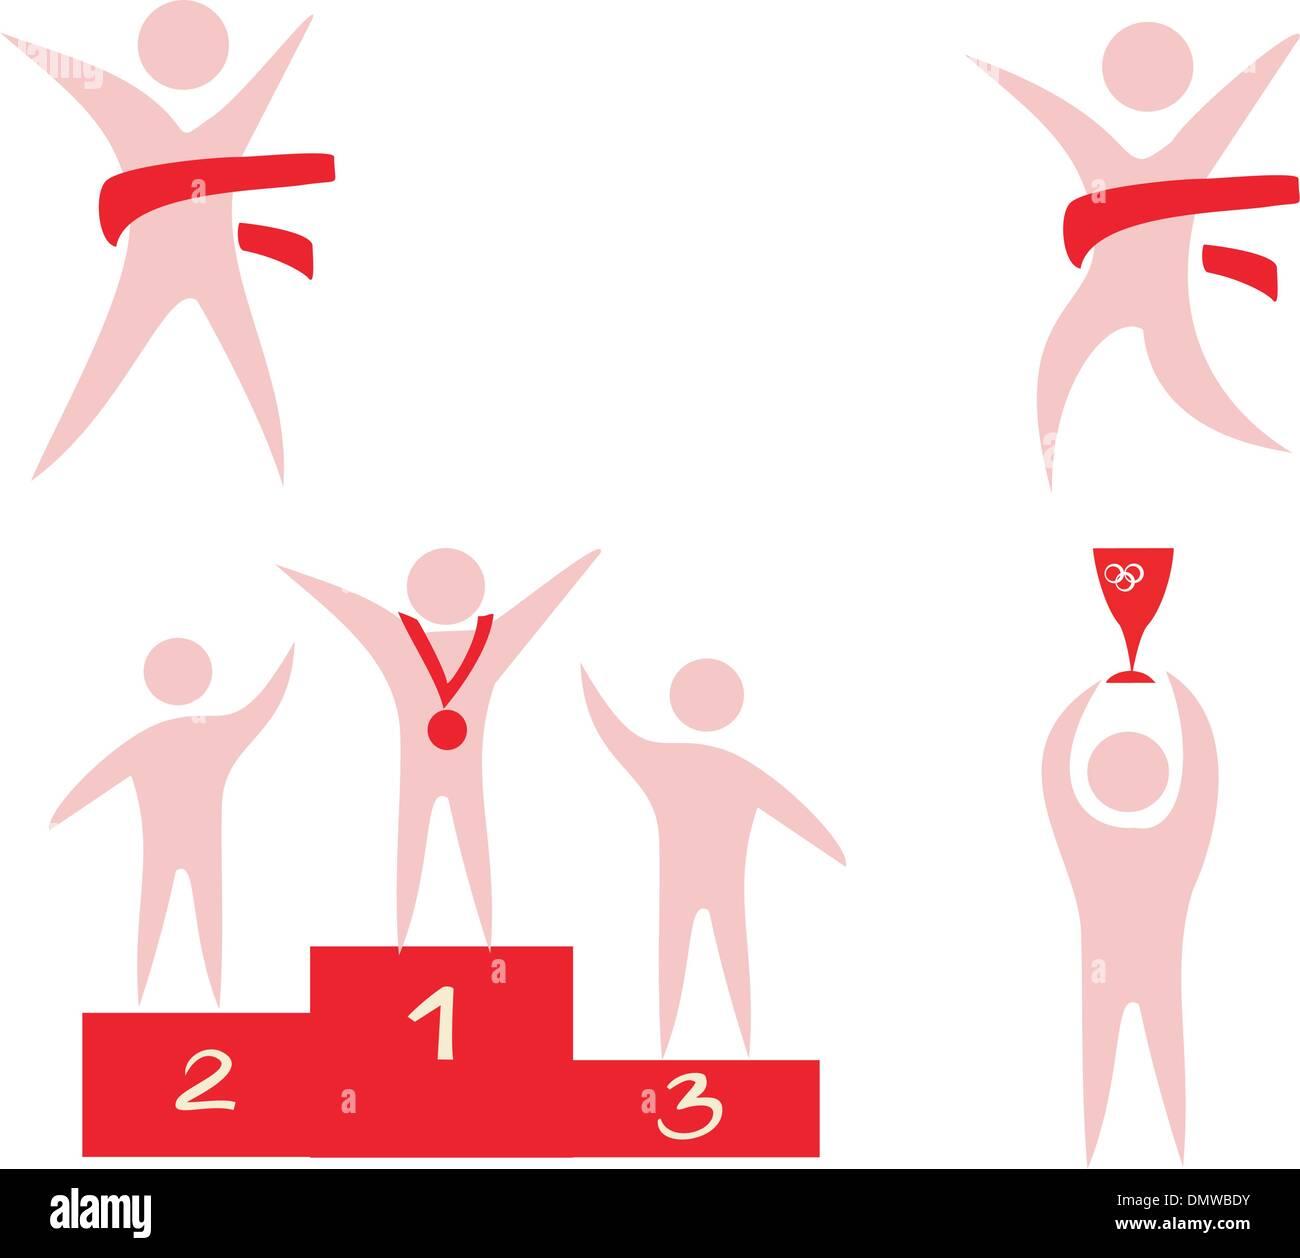 Sport competition victory icons set of symbols stock vector art sport competition victory icons set of symbols biocorpaavc